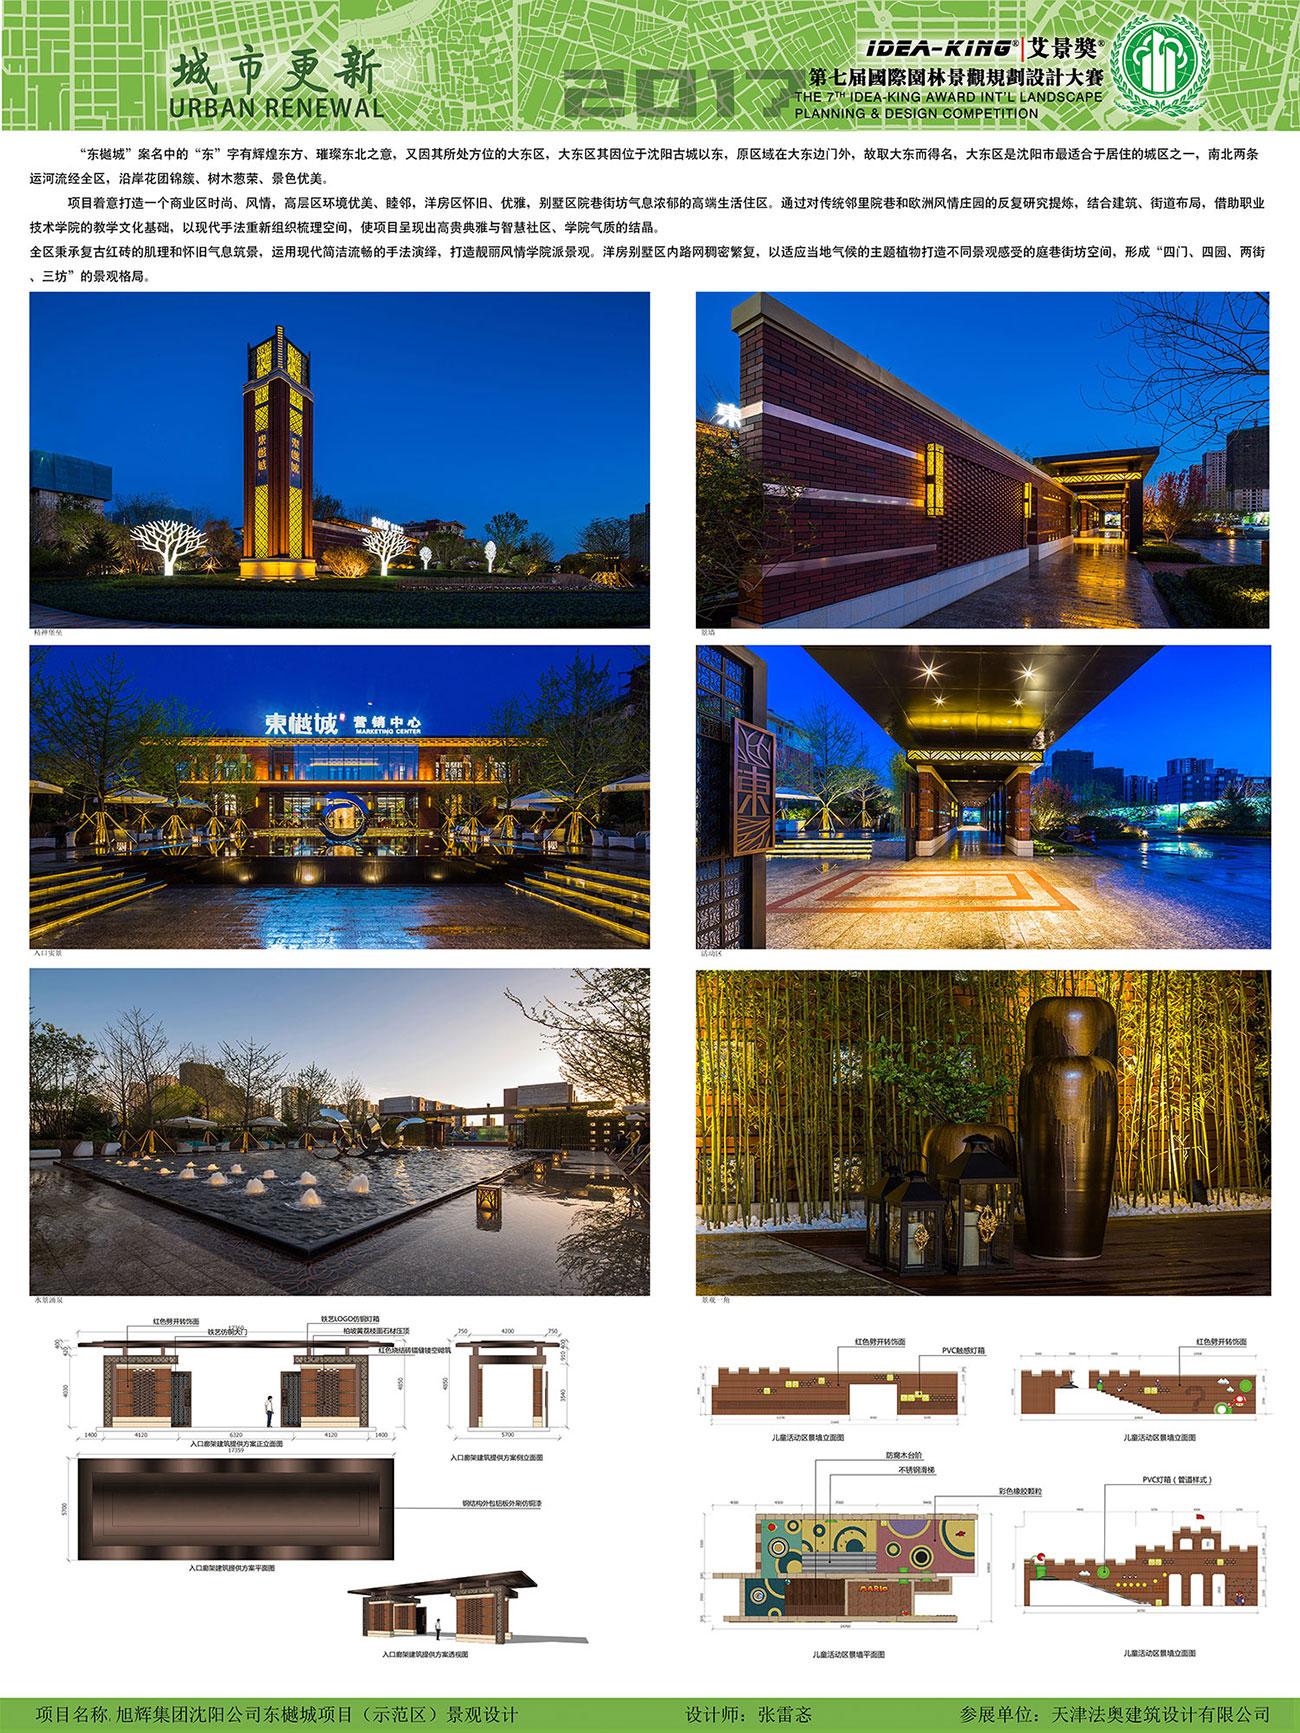 <b>旭辉集团沈阳公司东樾城项目(示范区)景观设计</b>